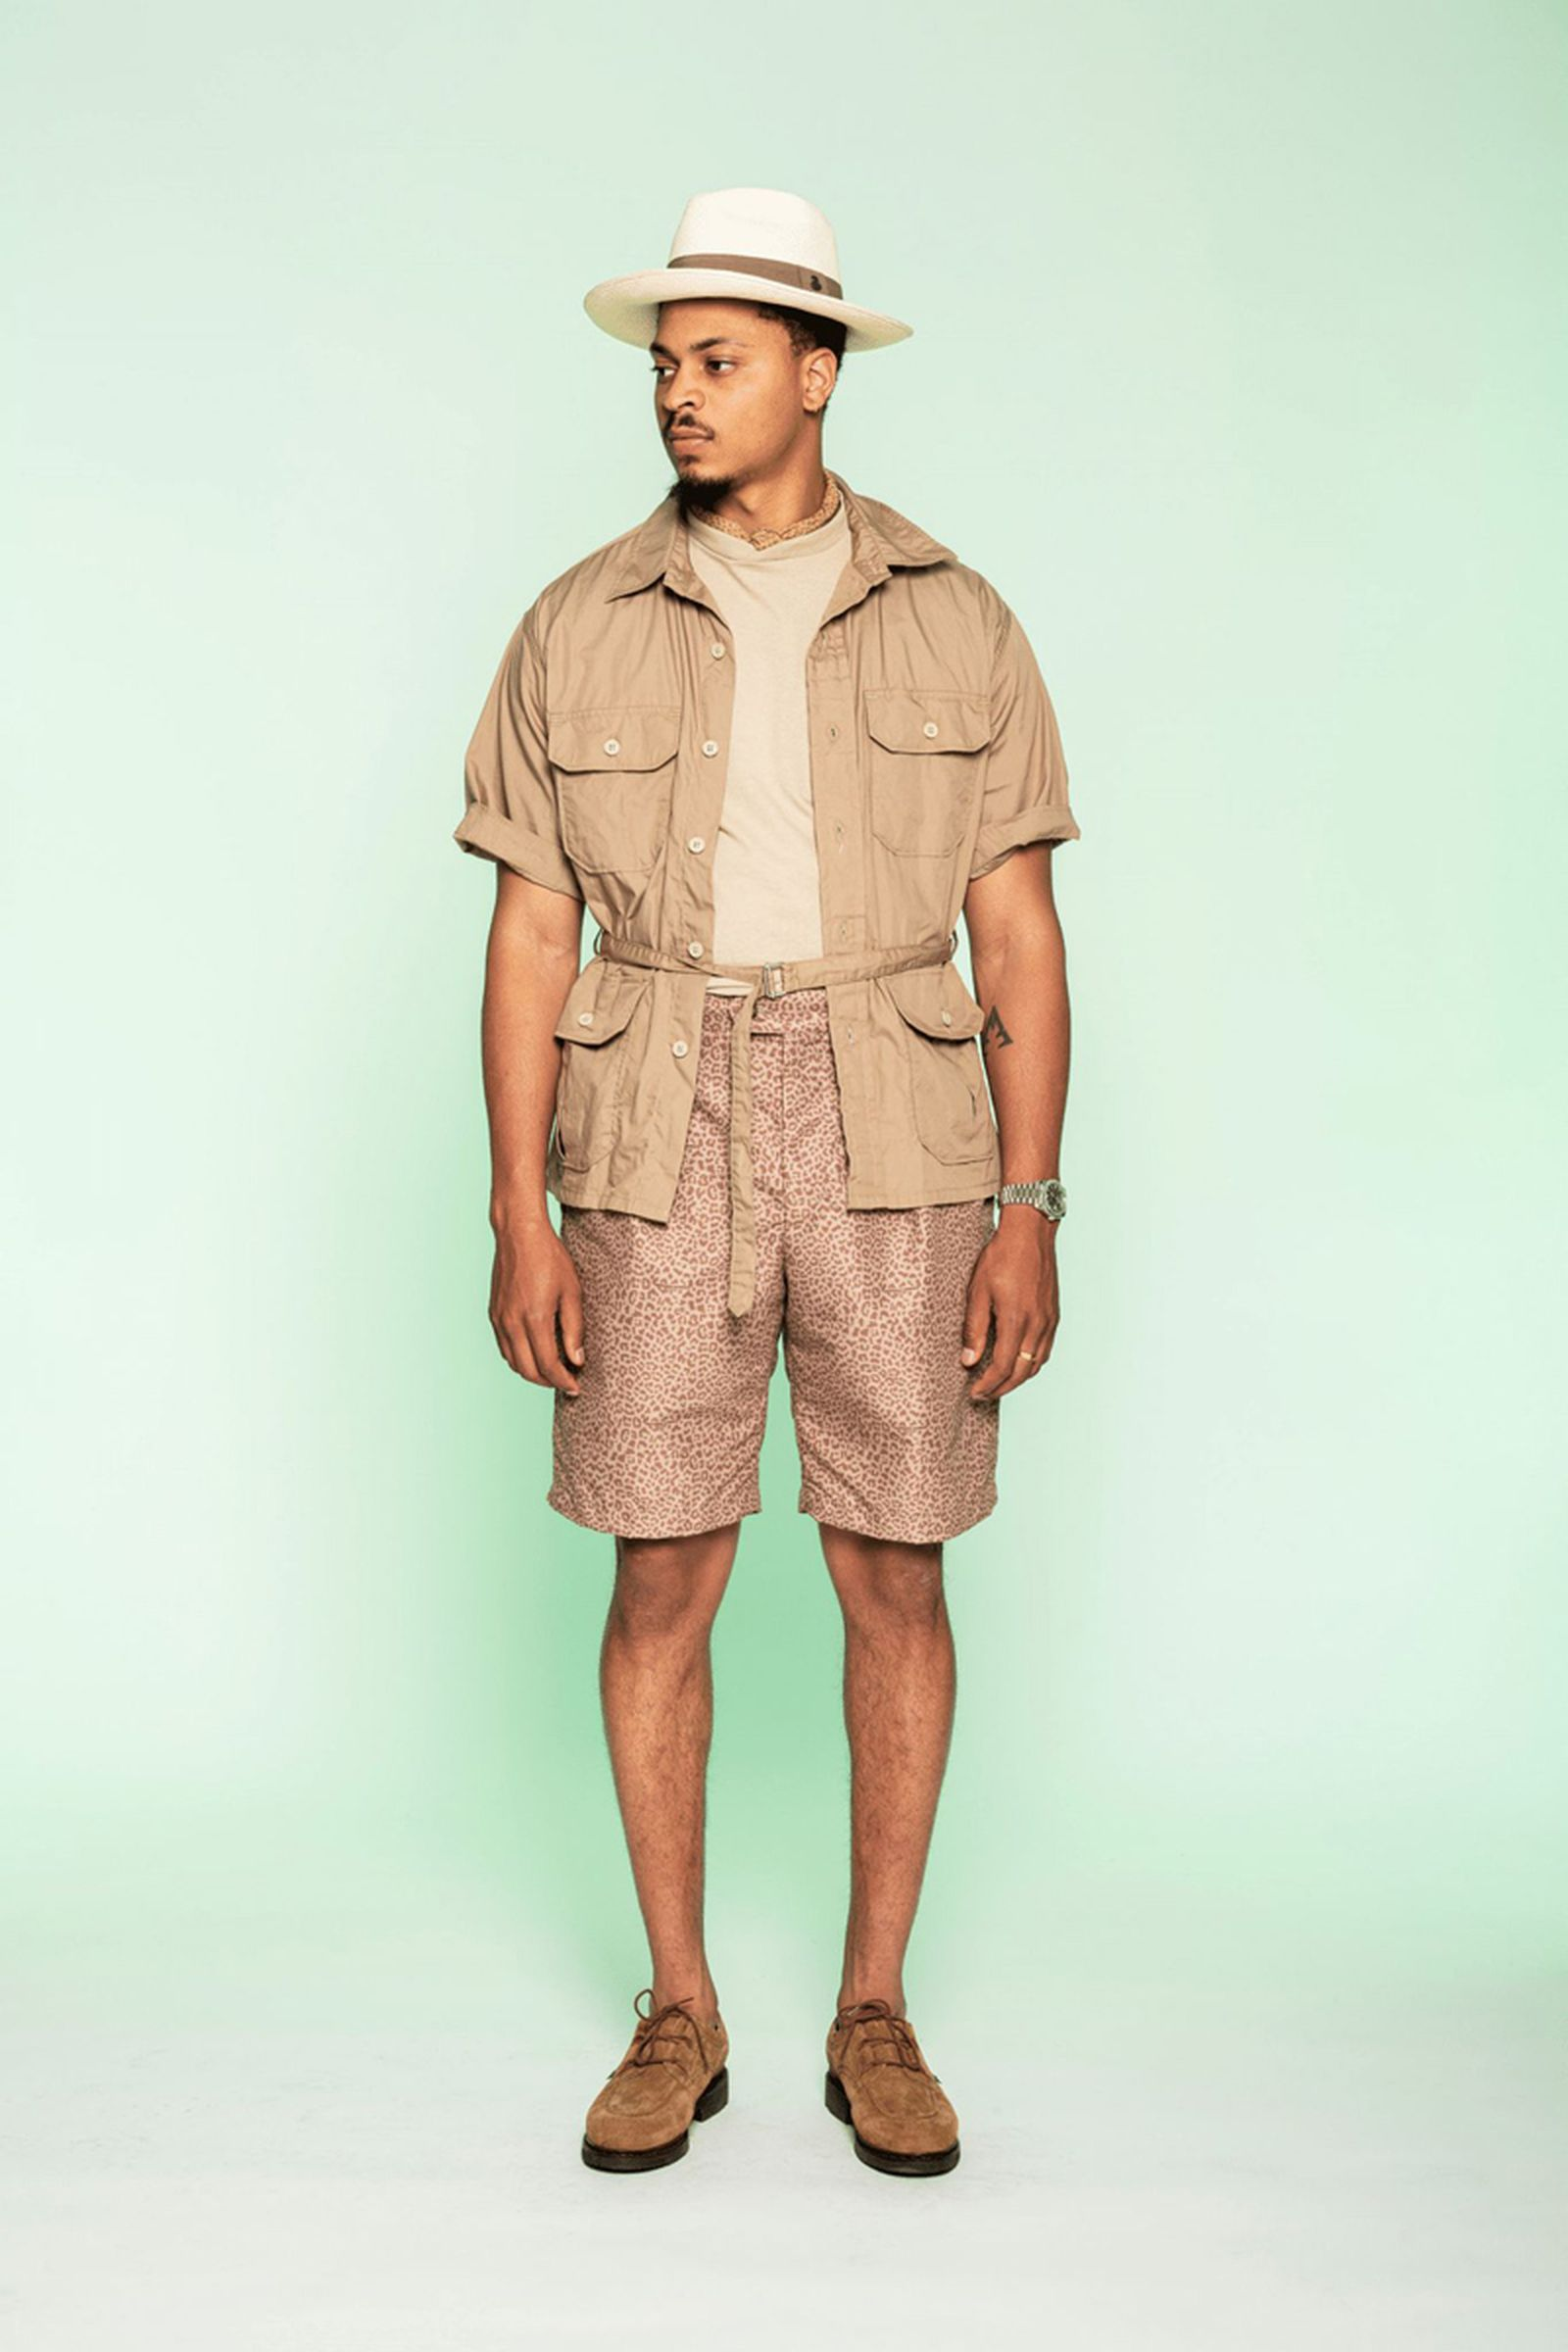 engineered garments spring summer 2022 collection lookbook (25)